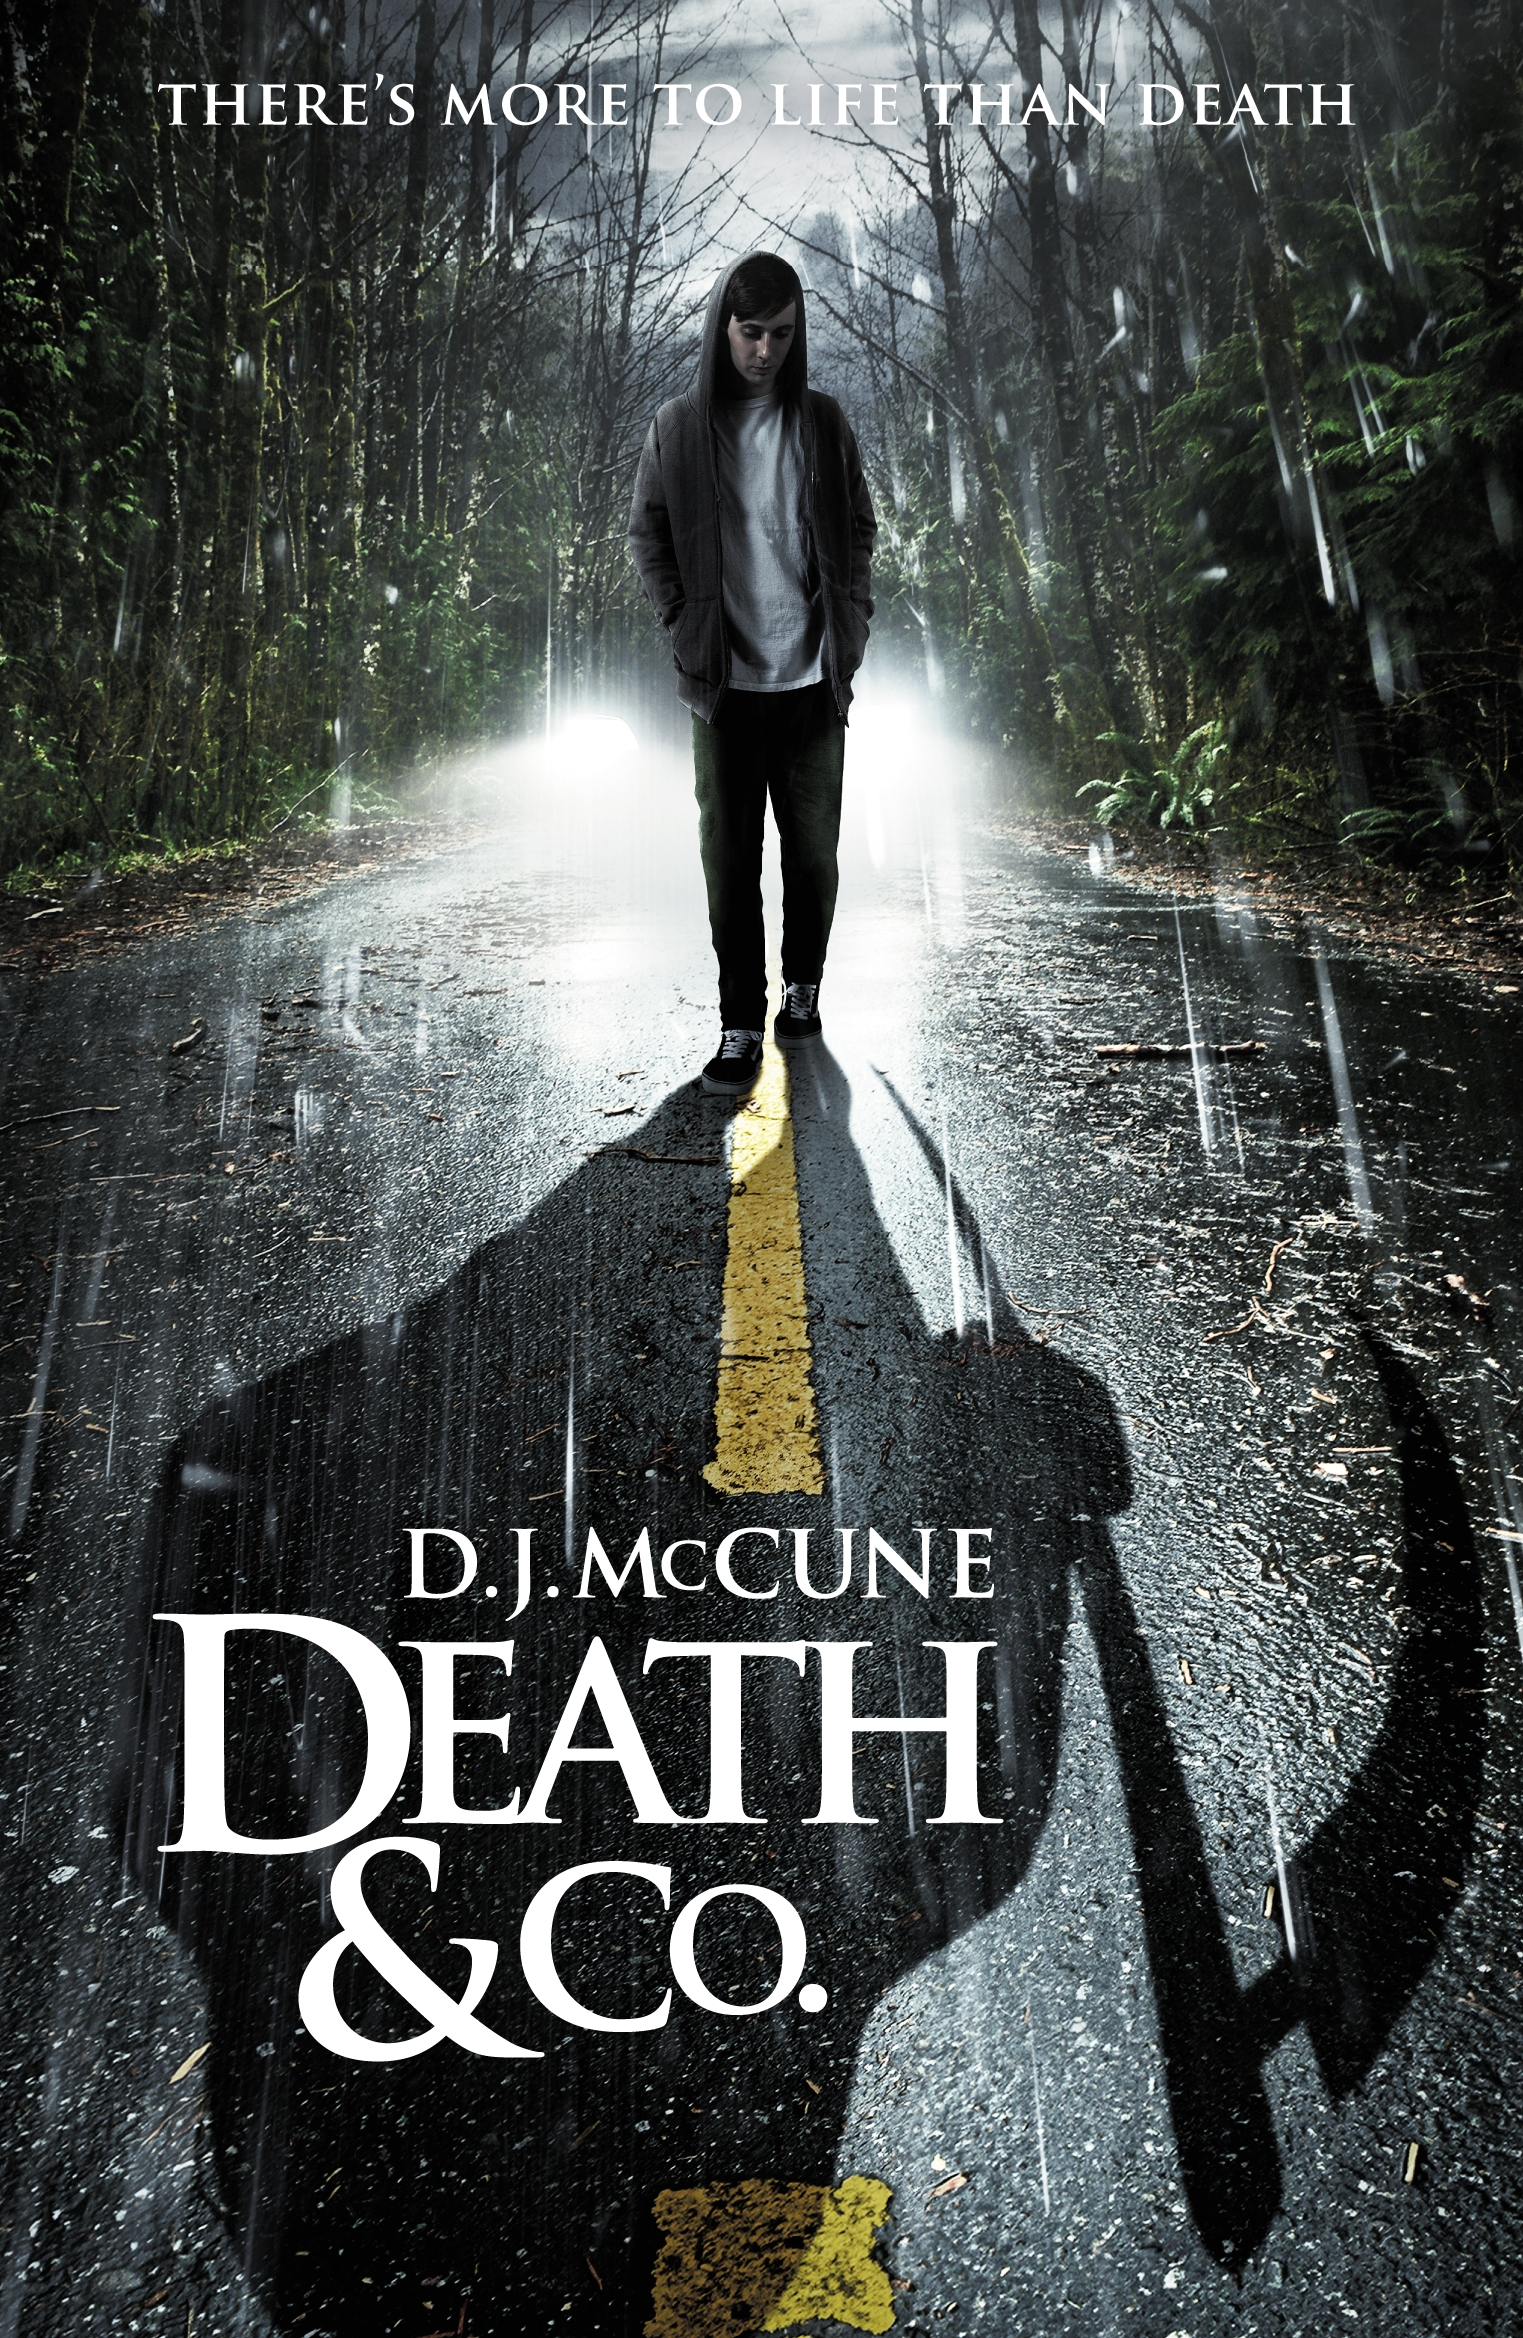 Death & Co. by D. J. McCune